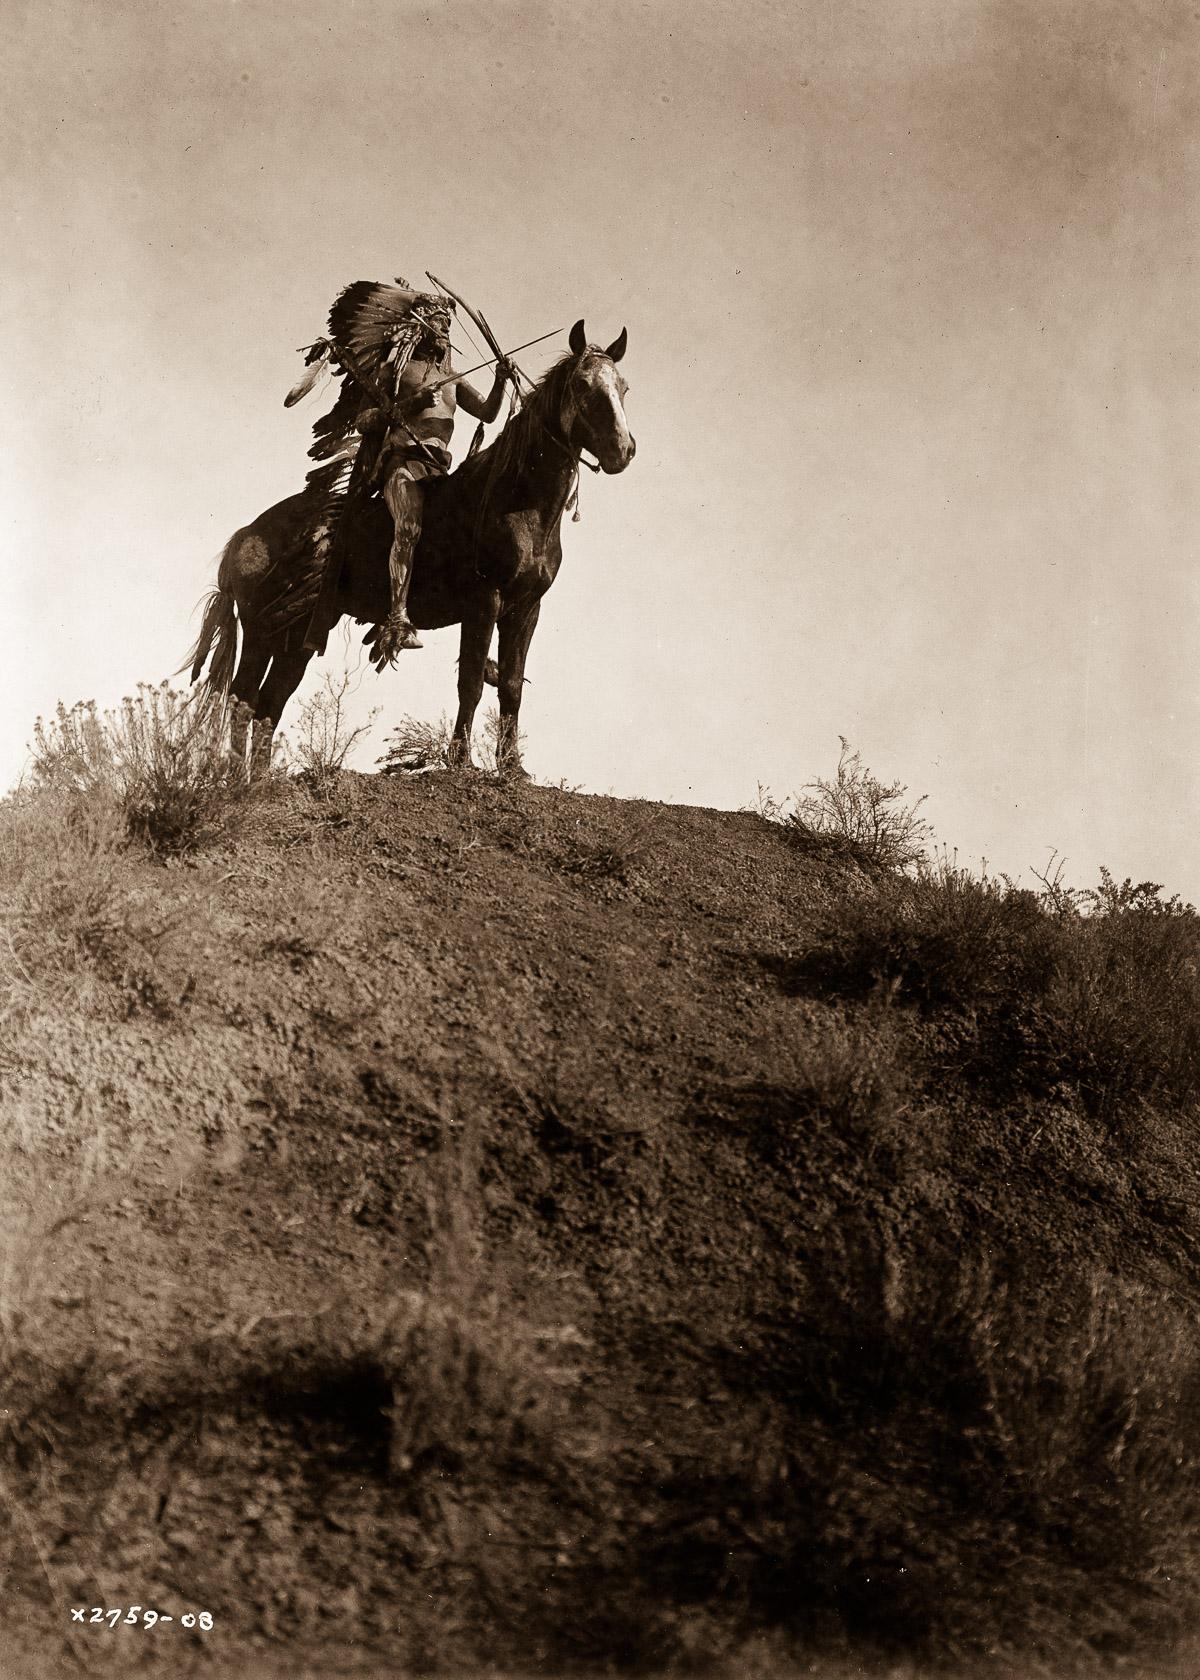 NativeAmerican-fotografia-oldskull-24